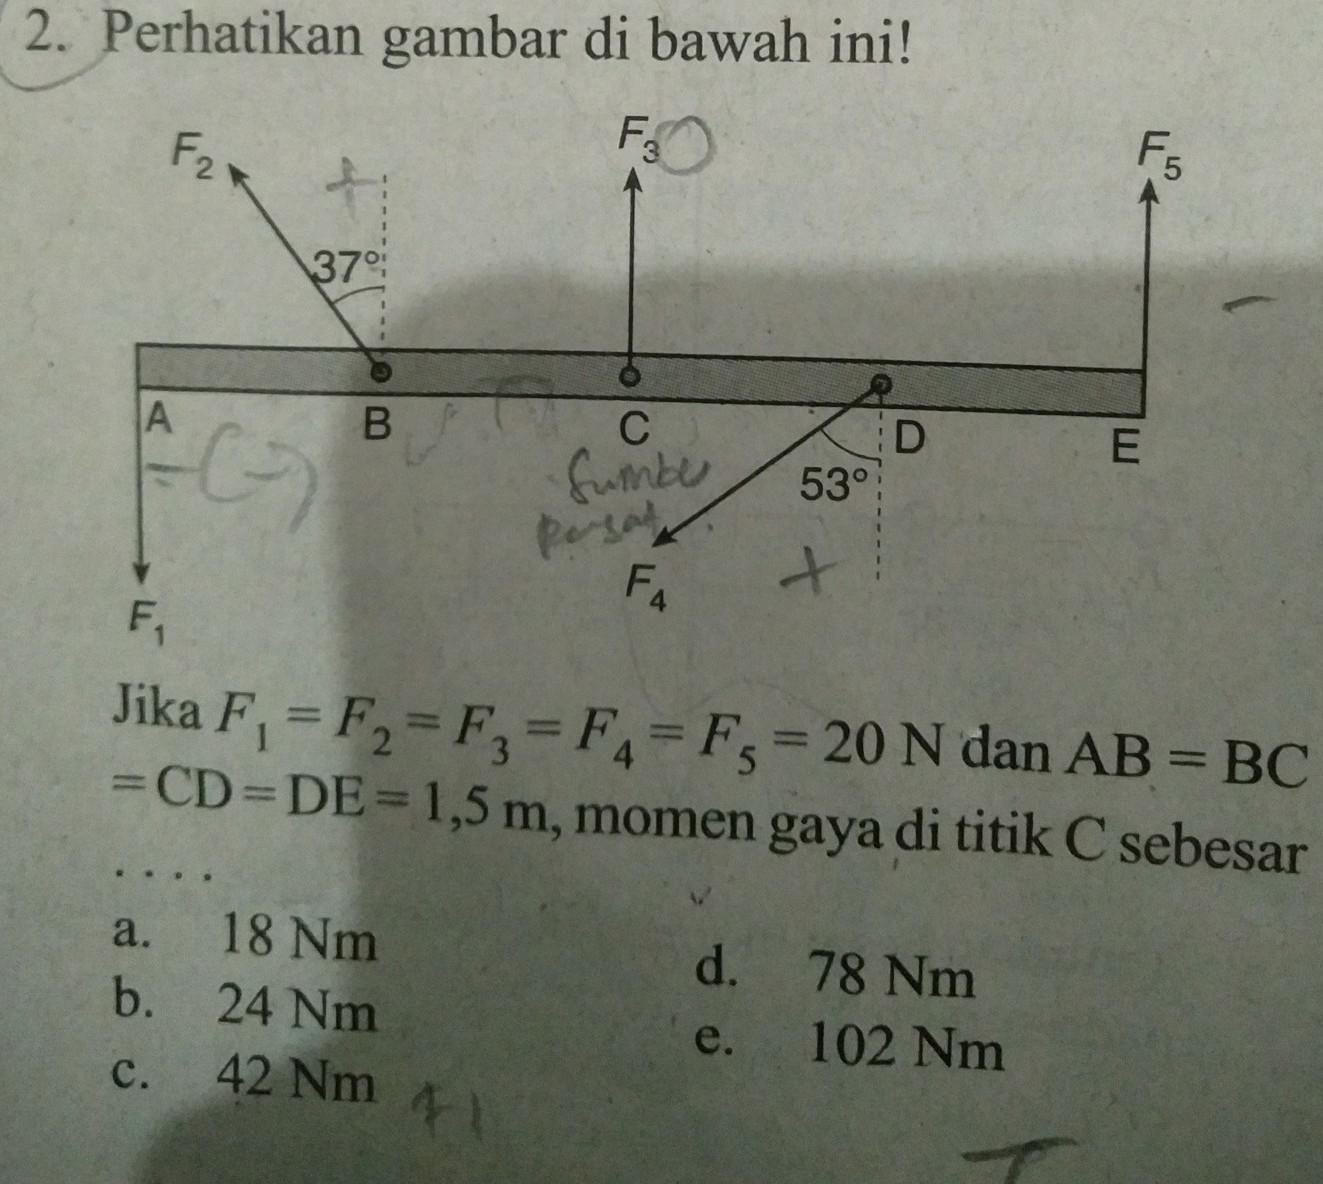 2. Perhatikan gambar di bawah ini!Jika F, =F= F = F = Fs ...